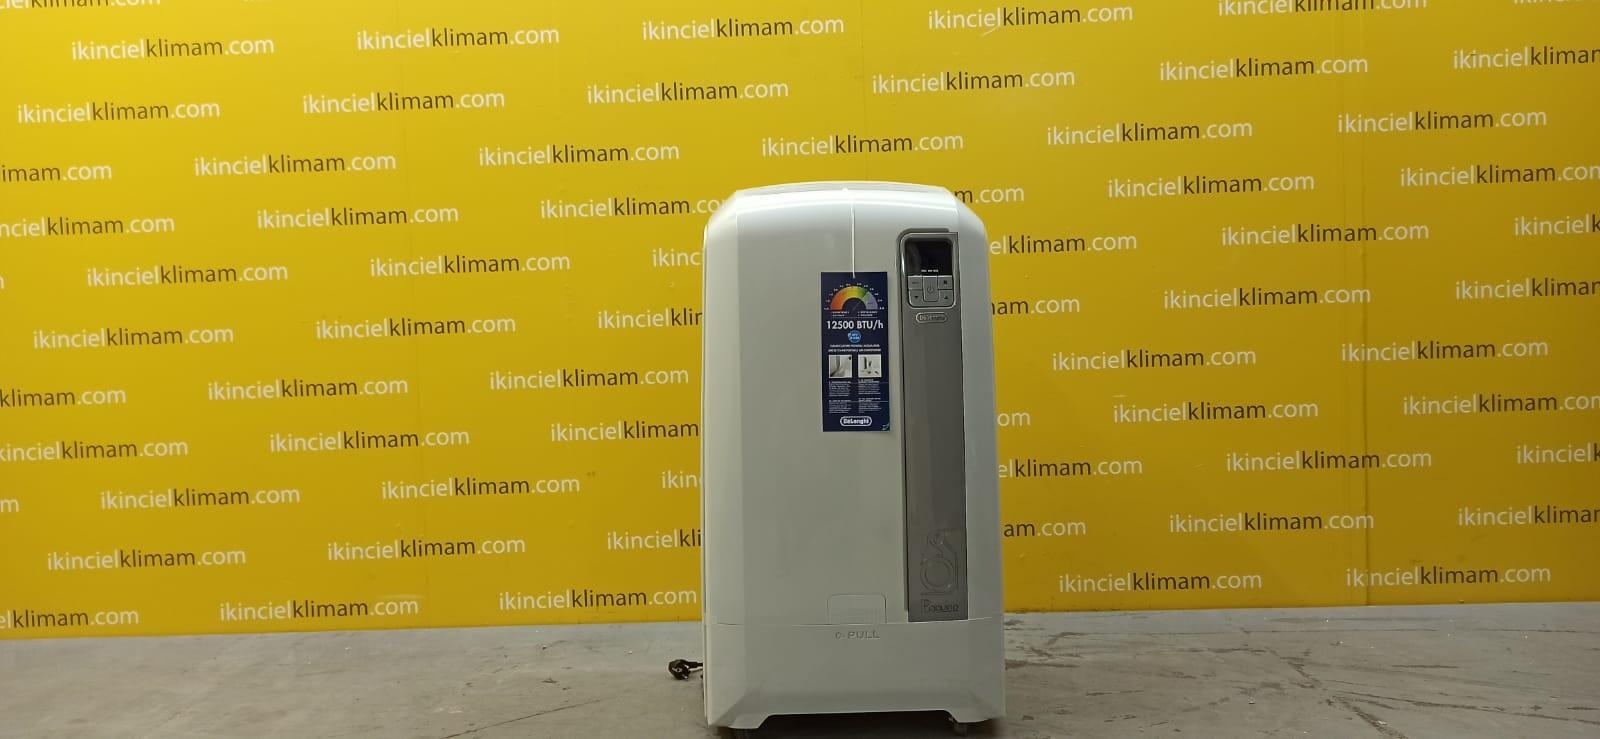 DELONGI PAC WE125 Pinguino ( Sadece Soğutma ) A Enerji Sınıfı 12500 BTU On-Off  Mobil Portatif Klima